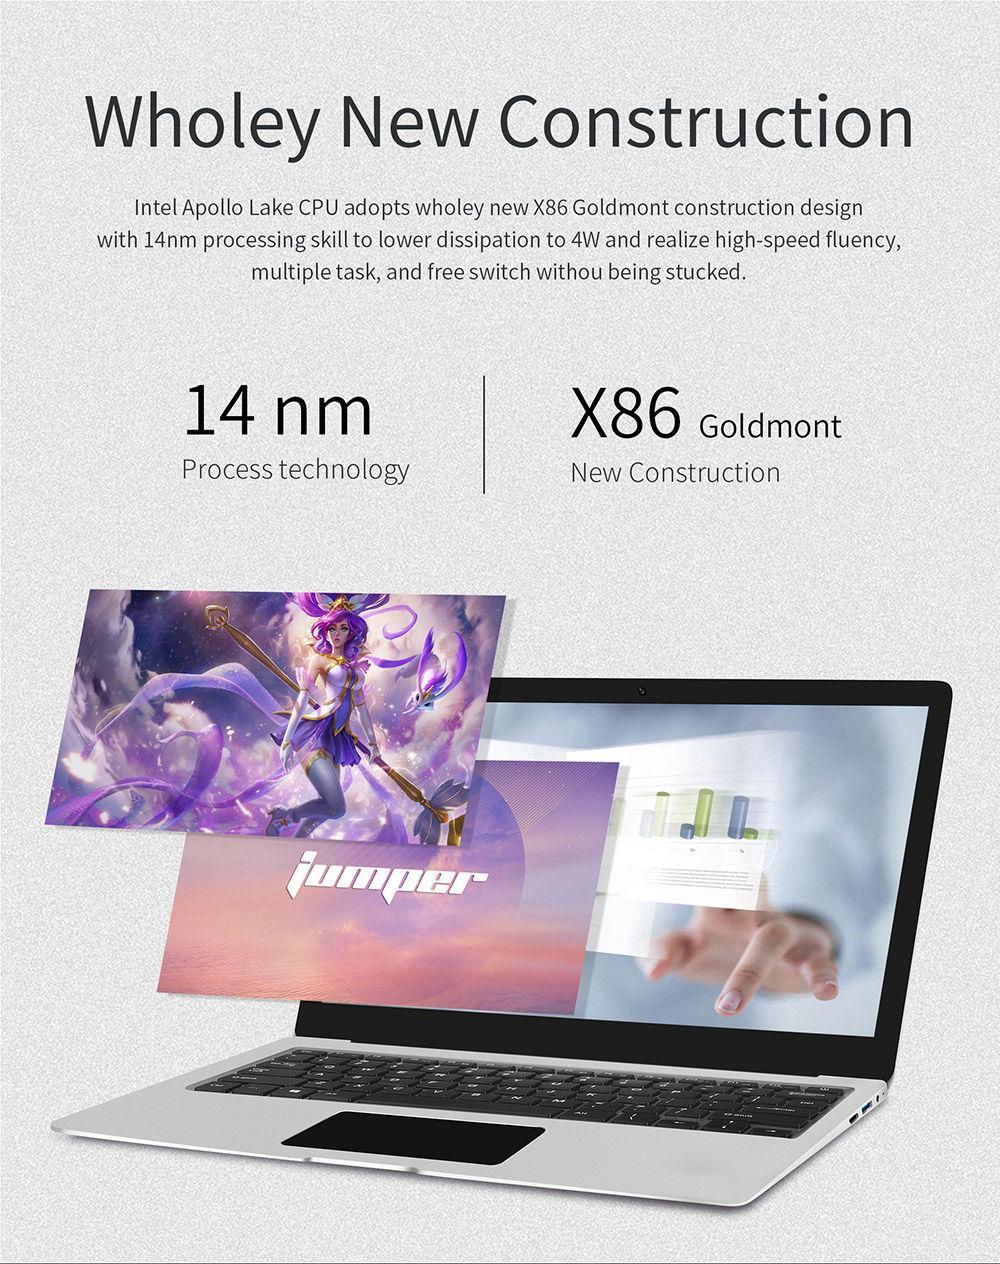 JUMPER EZBOOK 3 SE NOTEBOOK LAPTOP INTEL APOLLO LAKE N3350 245668 9  NEW Unique Jumper EZbook three SE Pocket book 13.3inch Ultrabook Laptop computer Home windows 10 Apollo Lake N3350 2.4GHz 3GB RAM 64GB ROM eMMC 3SE HTB19t7faaLN8KJjSZFGq6zjrVXaY